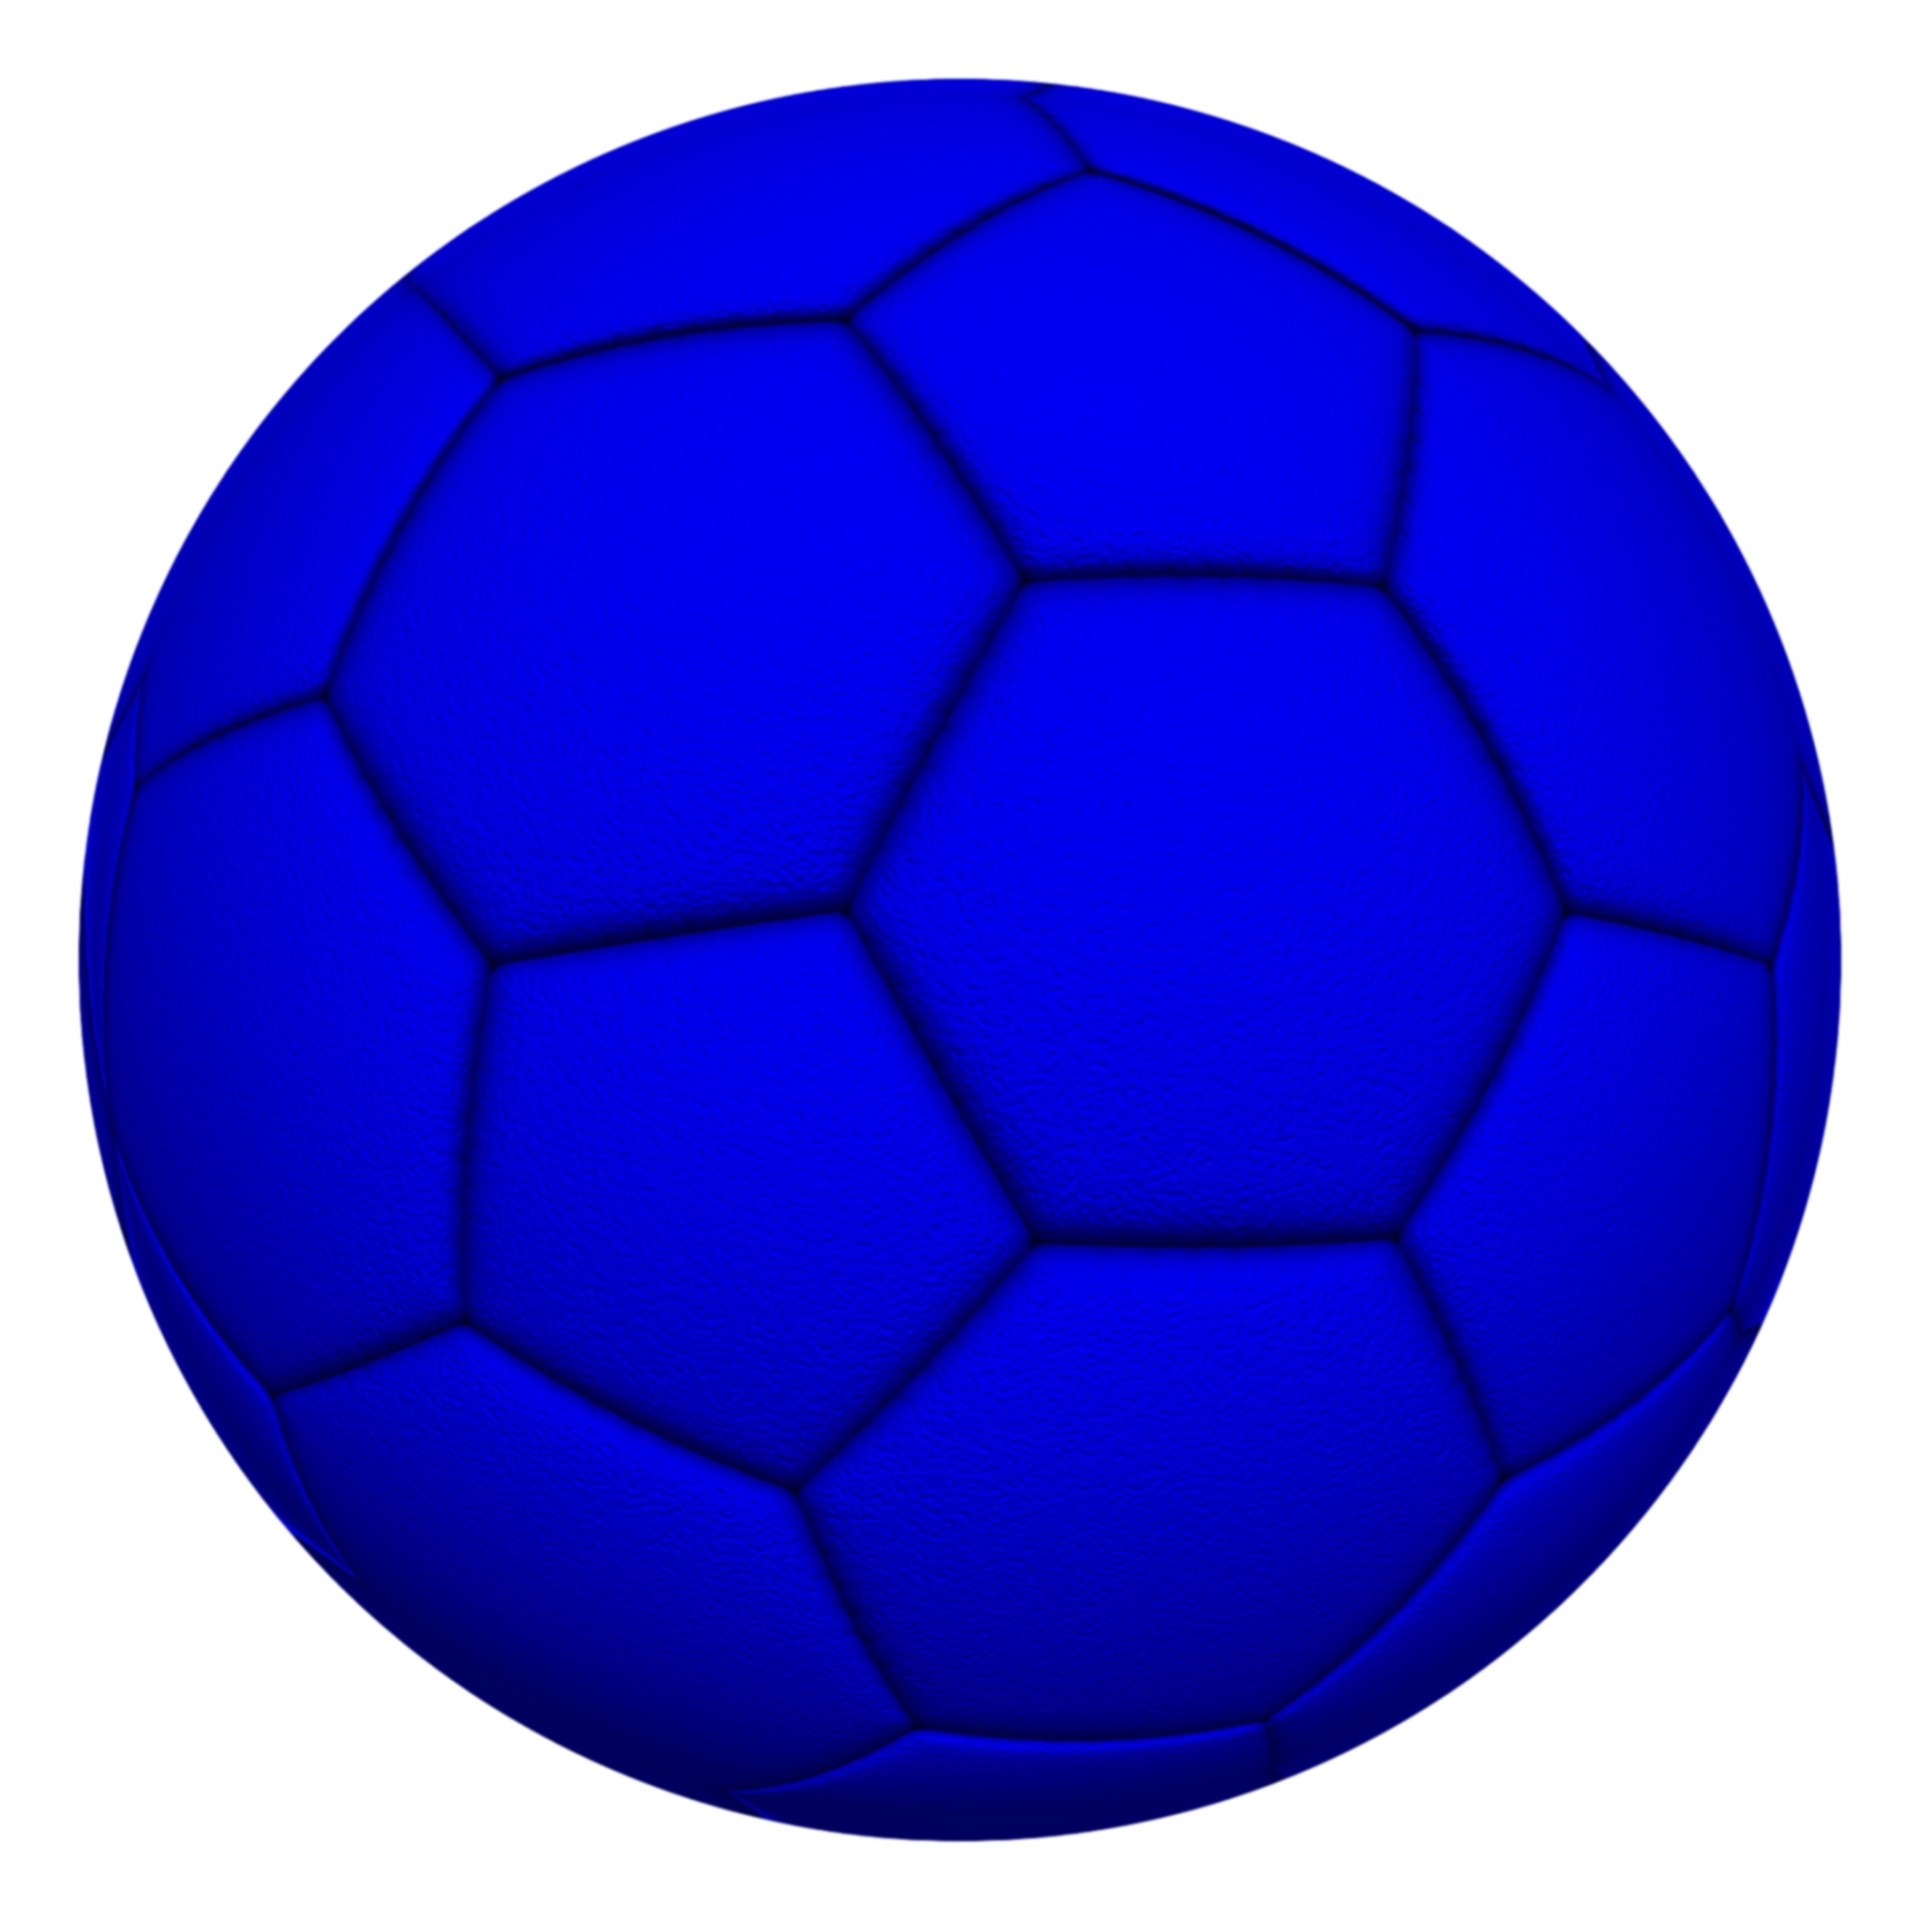 Soccer blue. Ball clipart football free